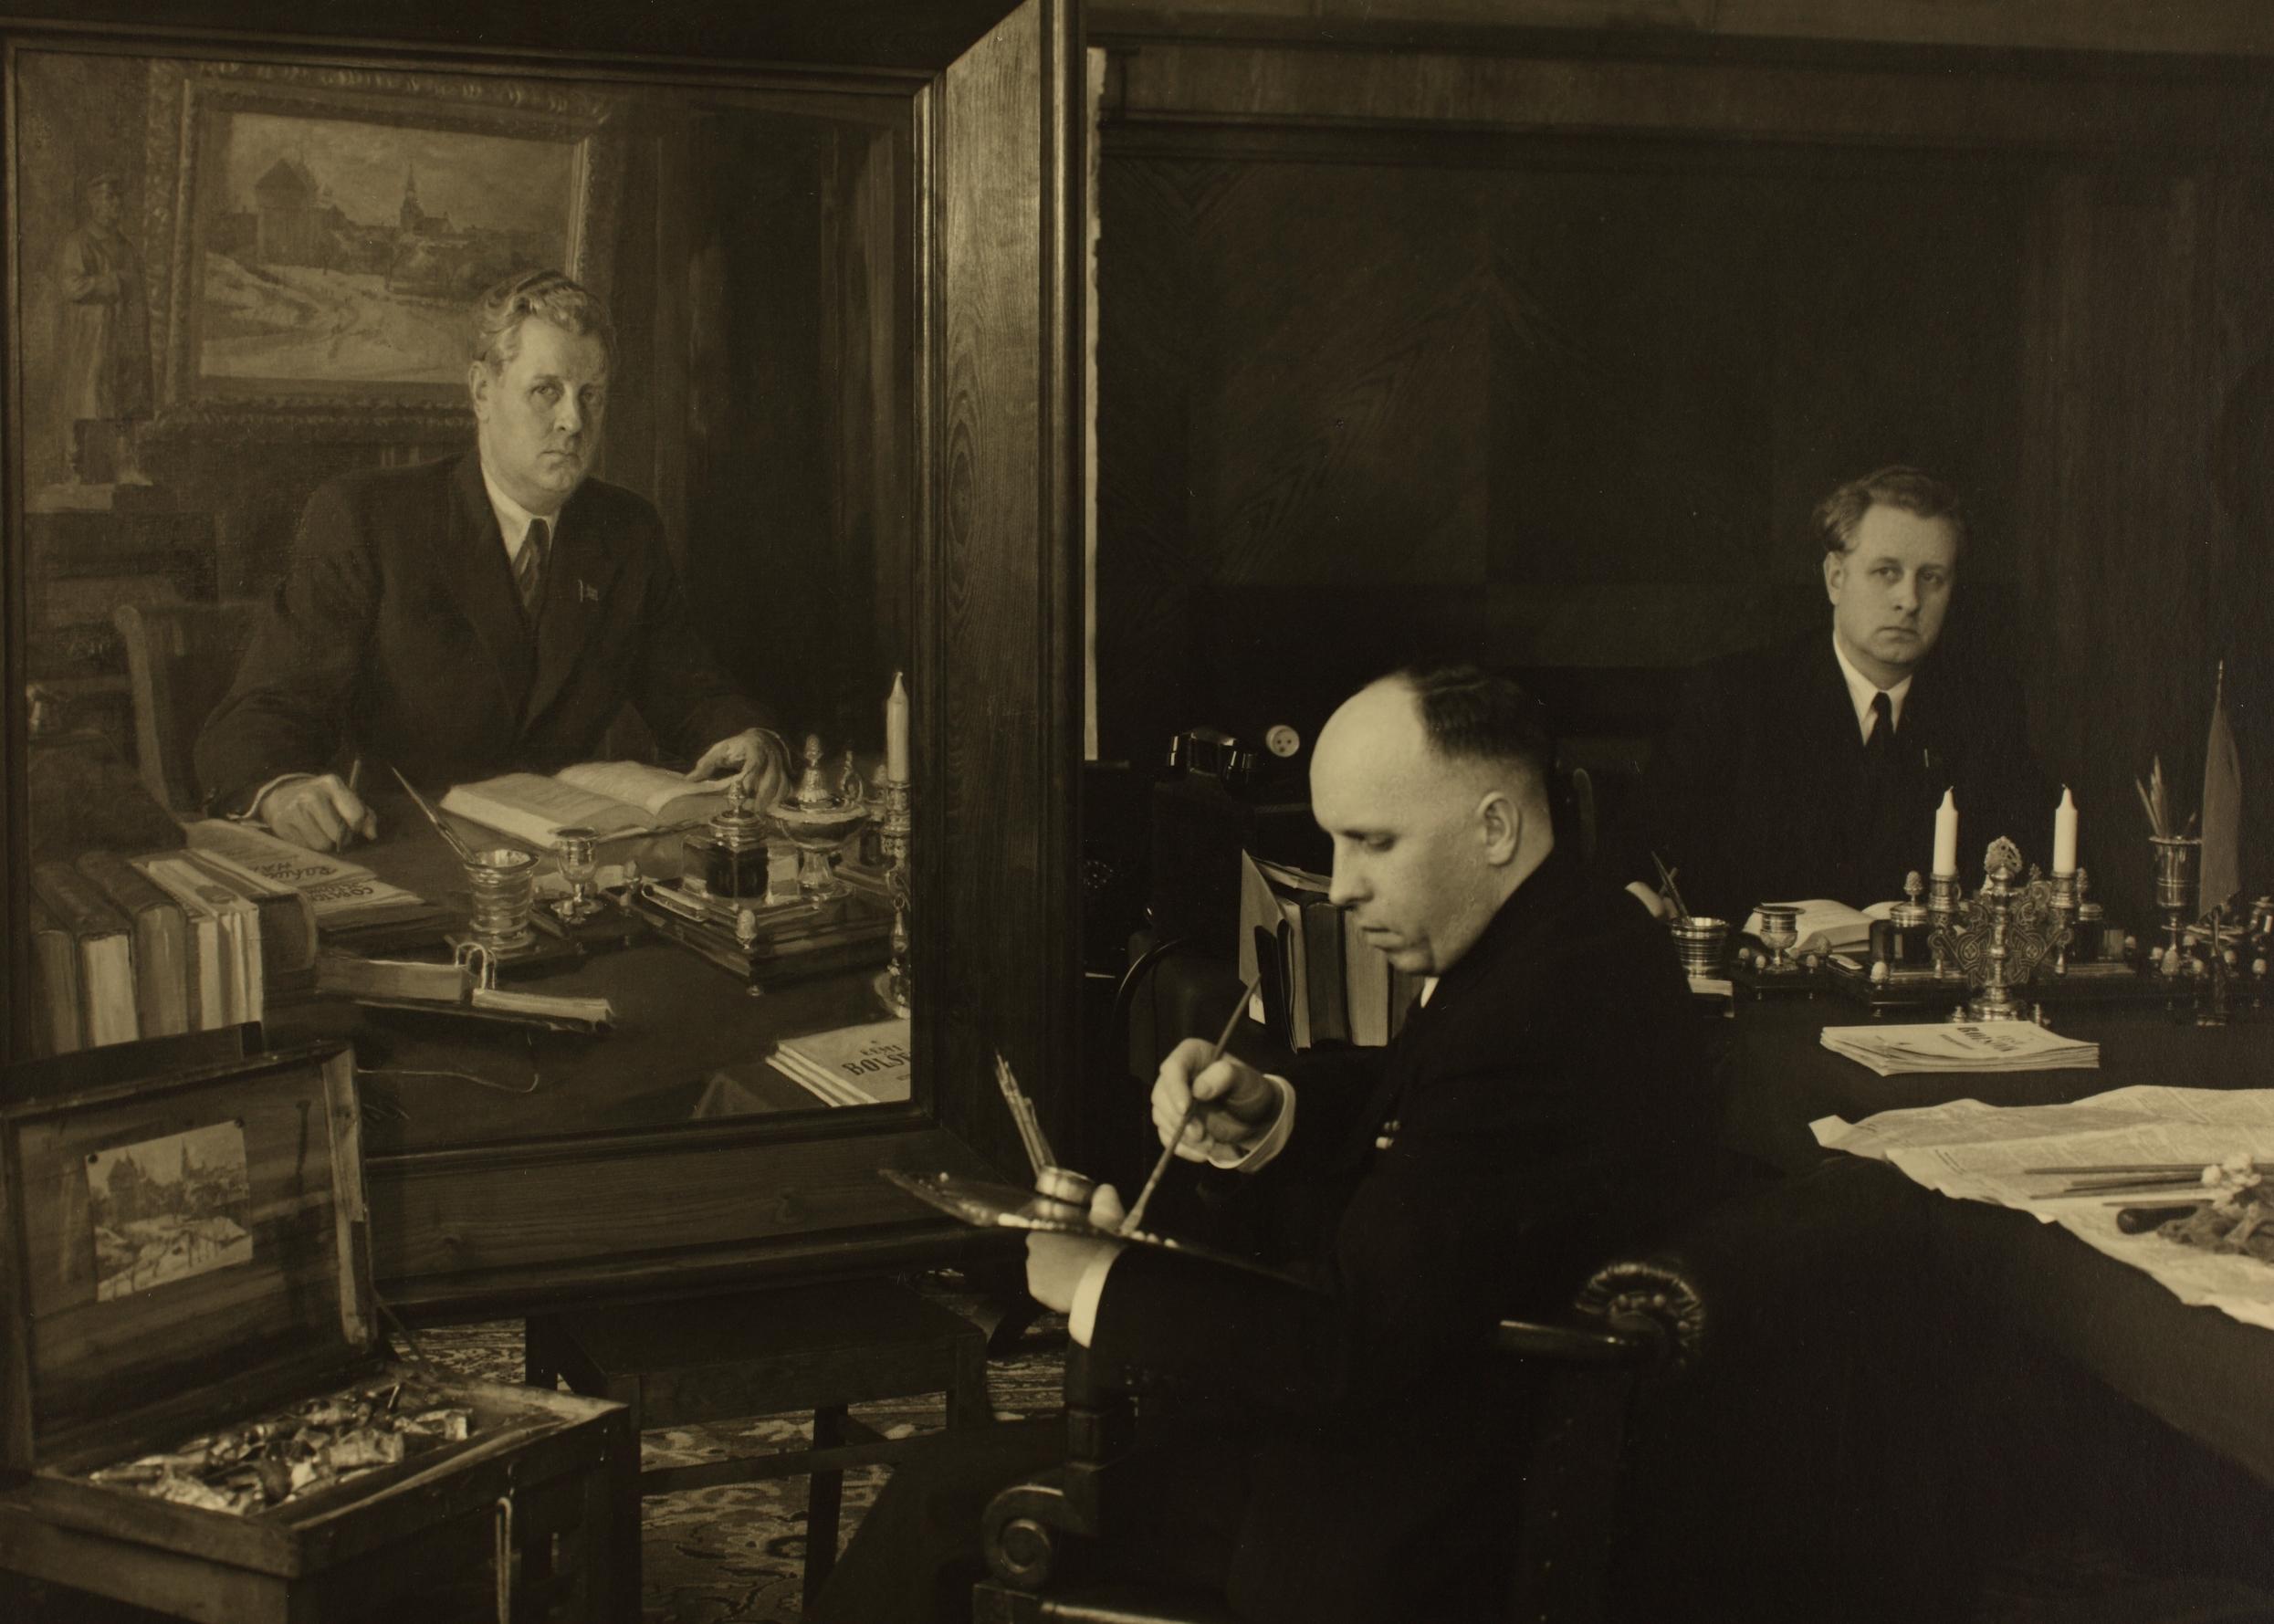 Nikolai Karotamm koos portretist Jar-Kravtšenkoga Karotamme kabinetis, 1947. ERAF.9607.1.973.2.